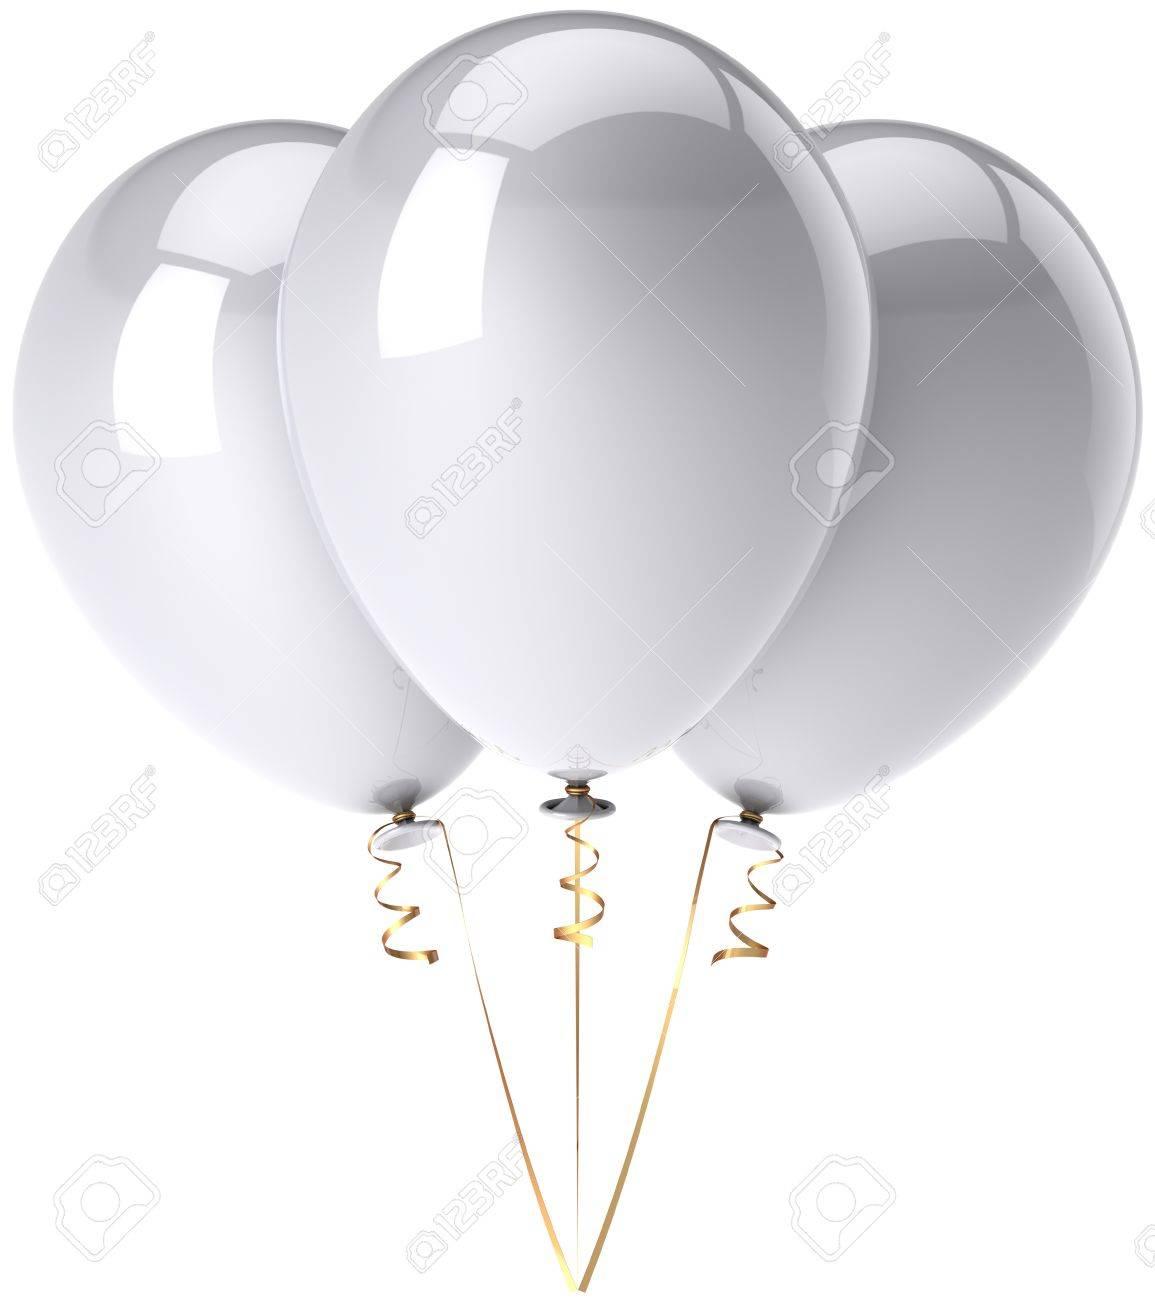 Shiny Balloons Party Balloons Total White Shiny And Beautifulbirthday Celebrate